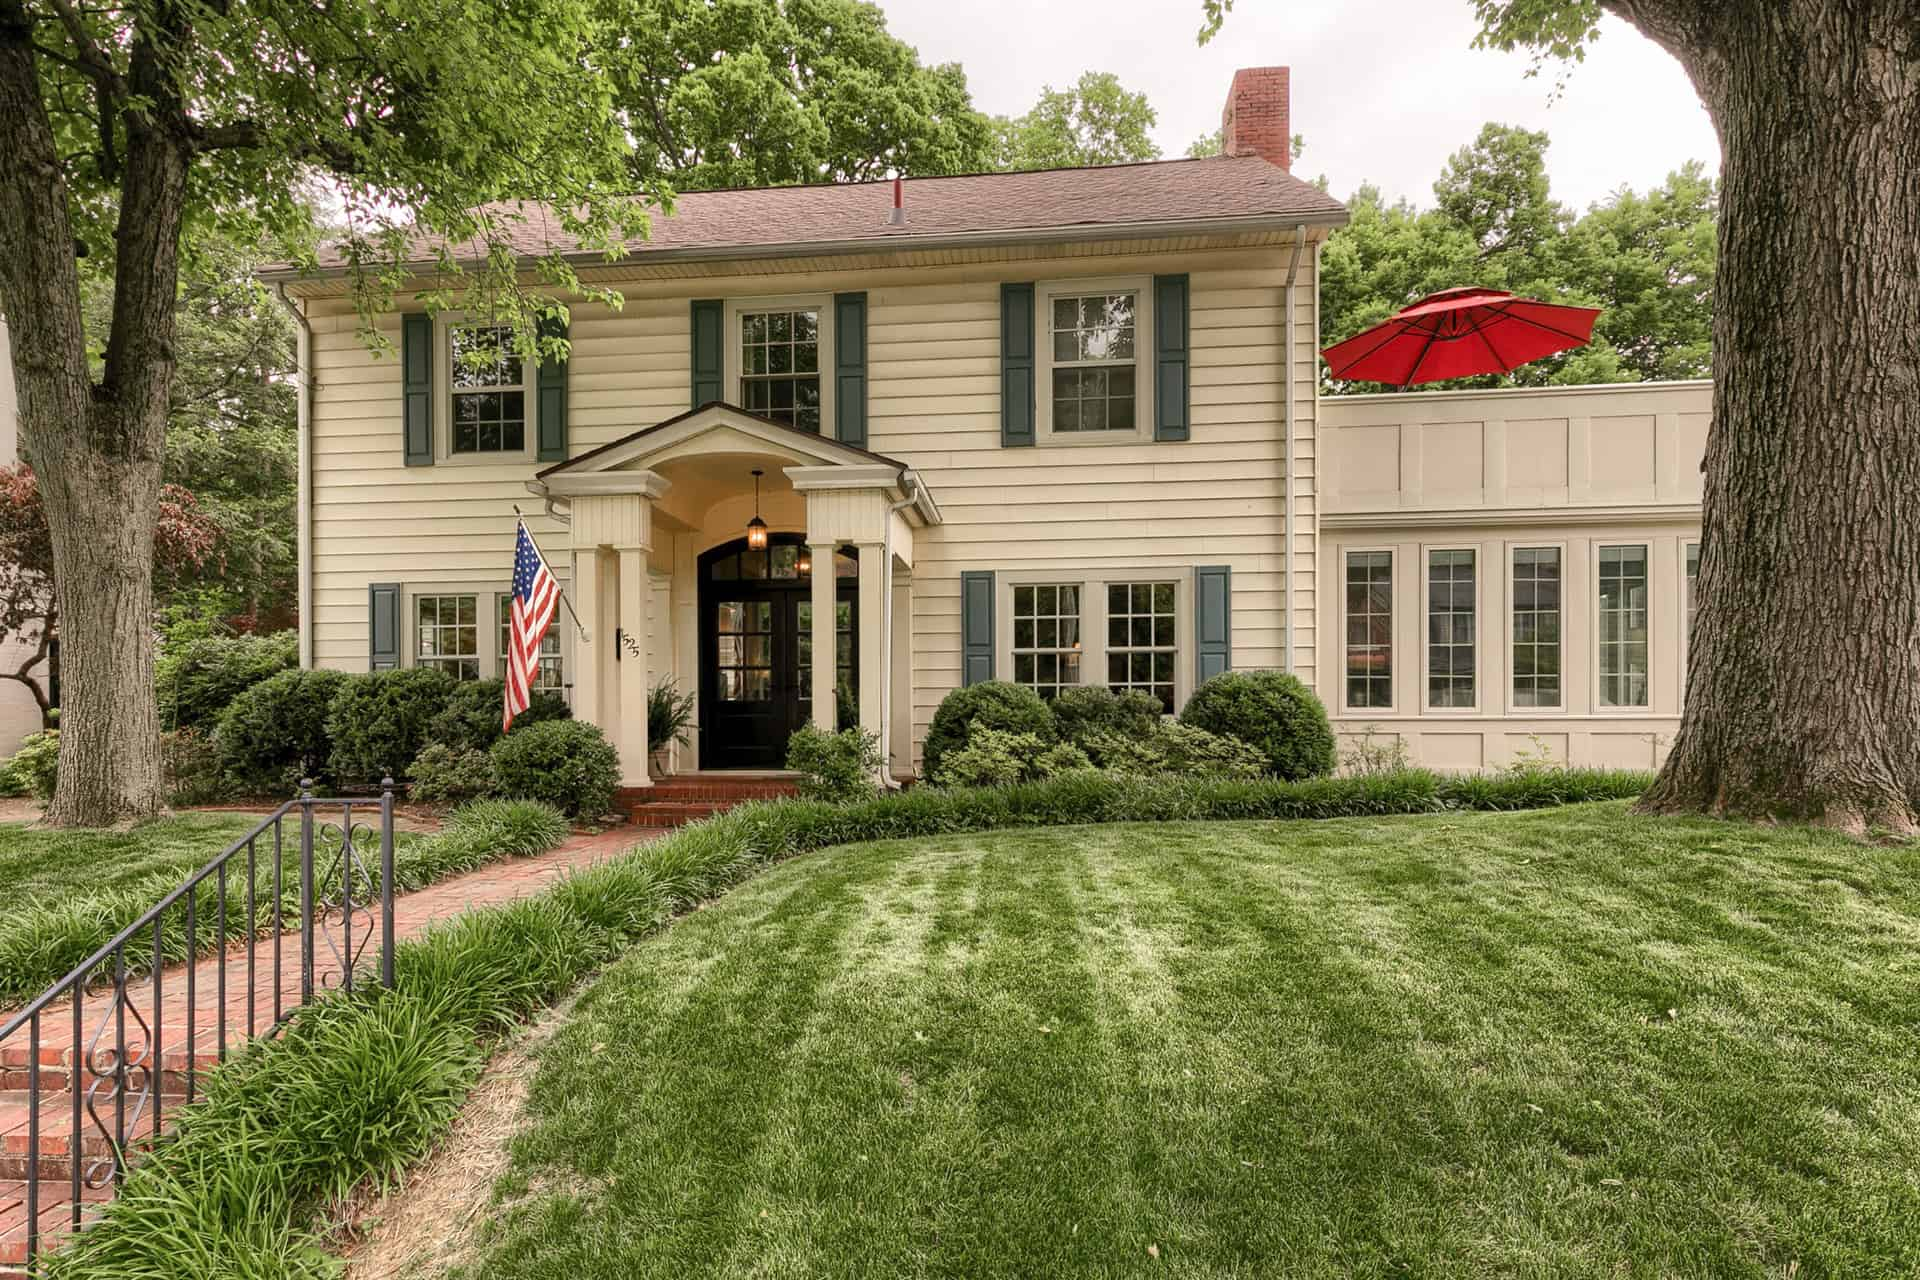 1525 Miller Court, Owensboro, KY 42301